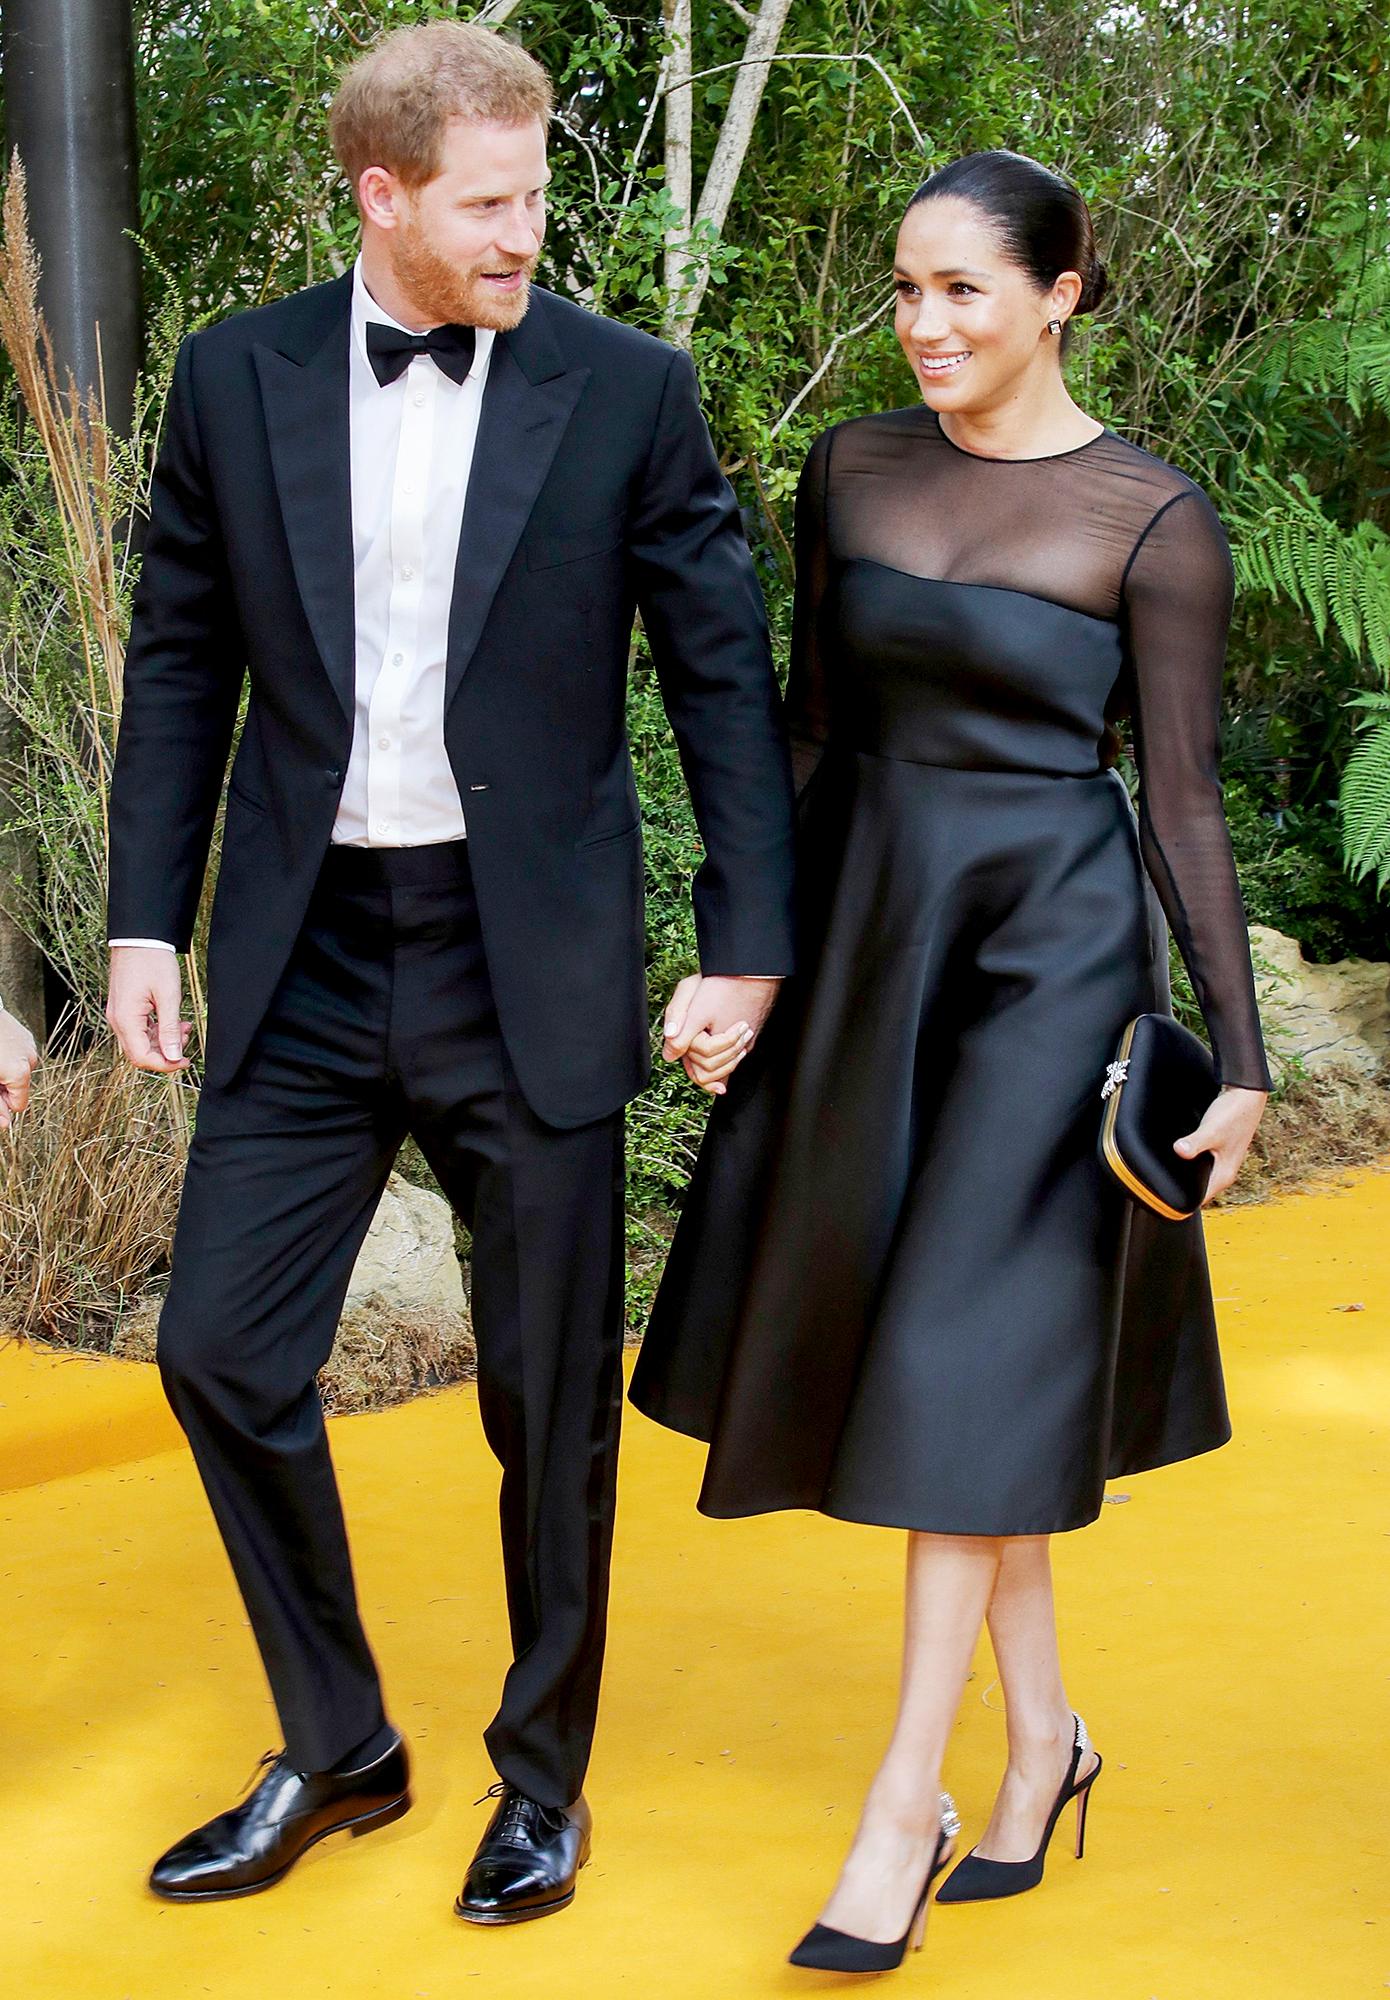 Prince-Harry-Duchess-Meghan-post-baby-body